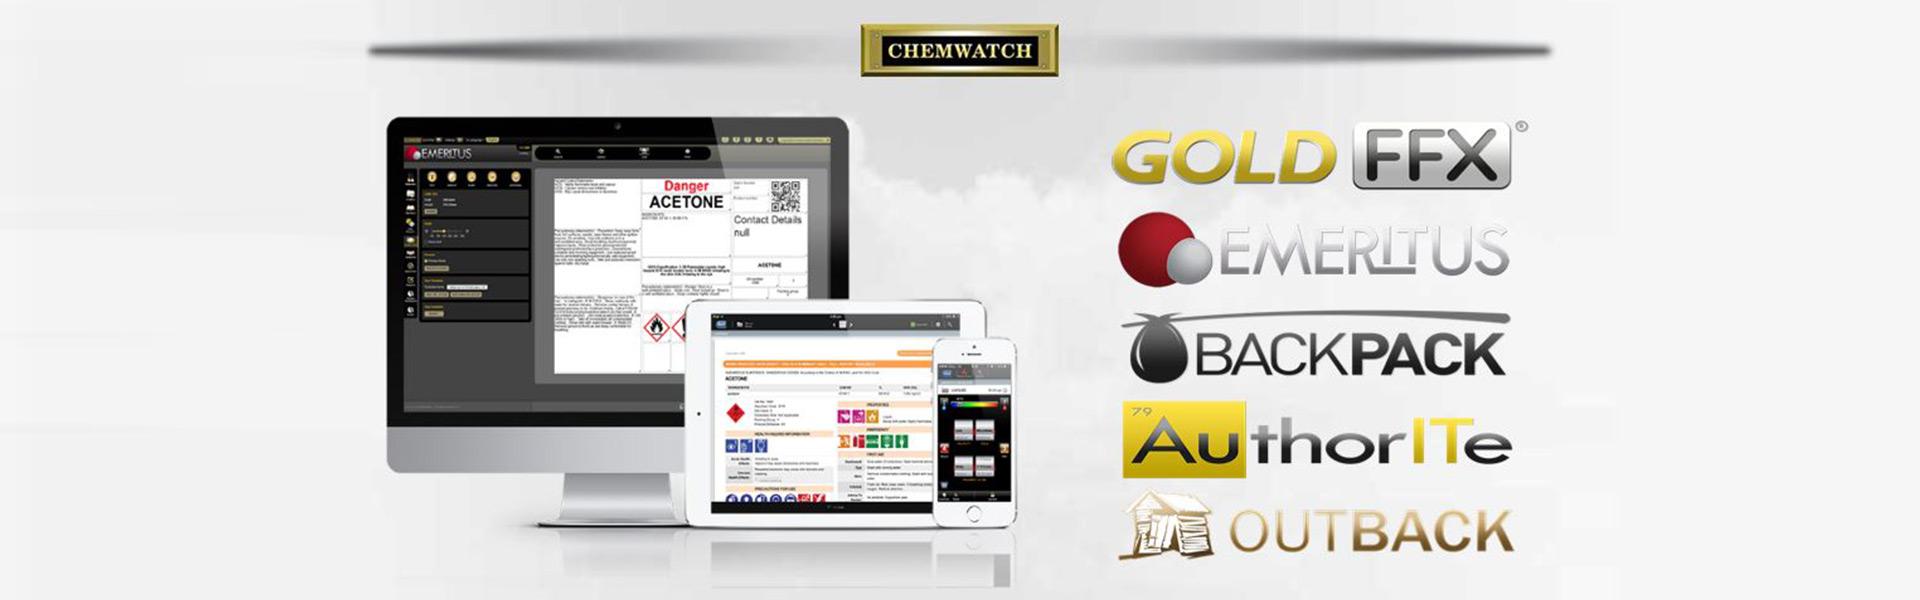 chemwatch-1